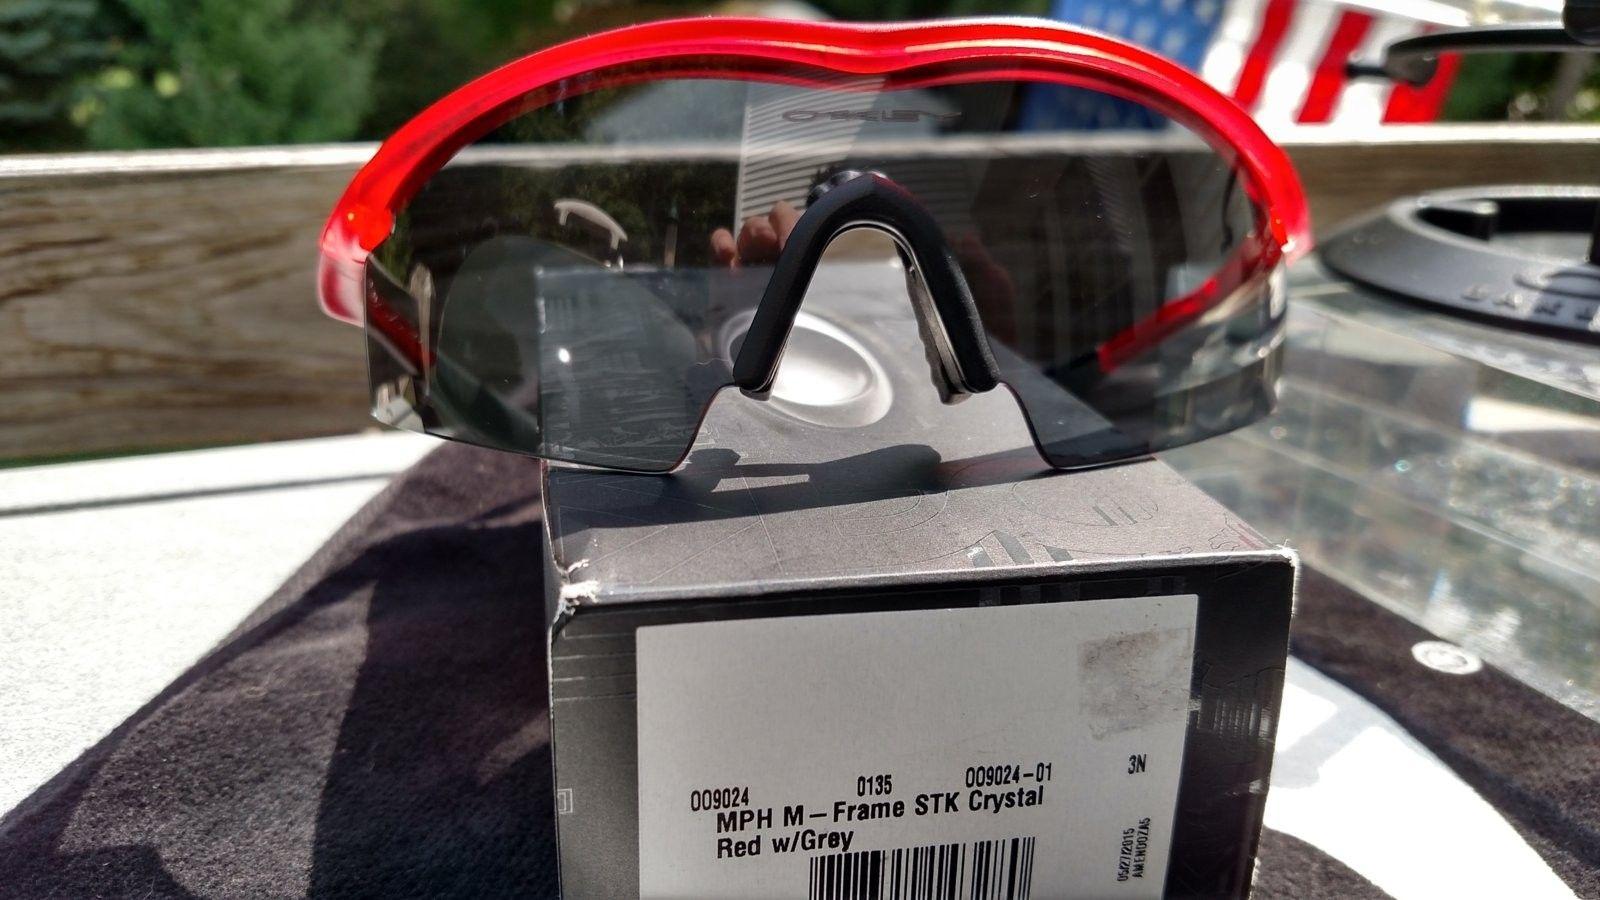 M Frame w/Crystal Red Frame, Grey Lens - BNIB - IMG_20160903_131759992_HDR.jpg